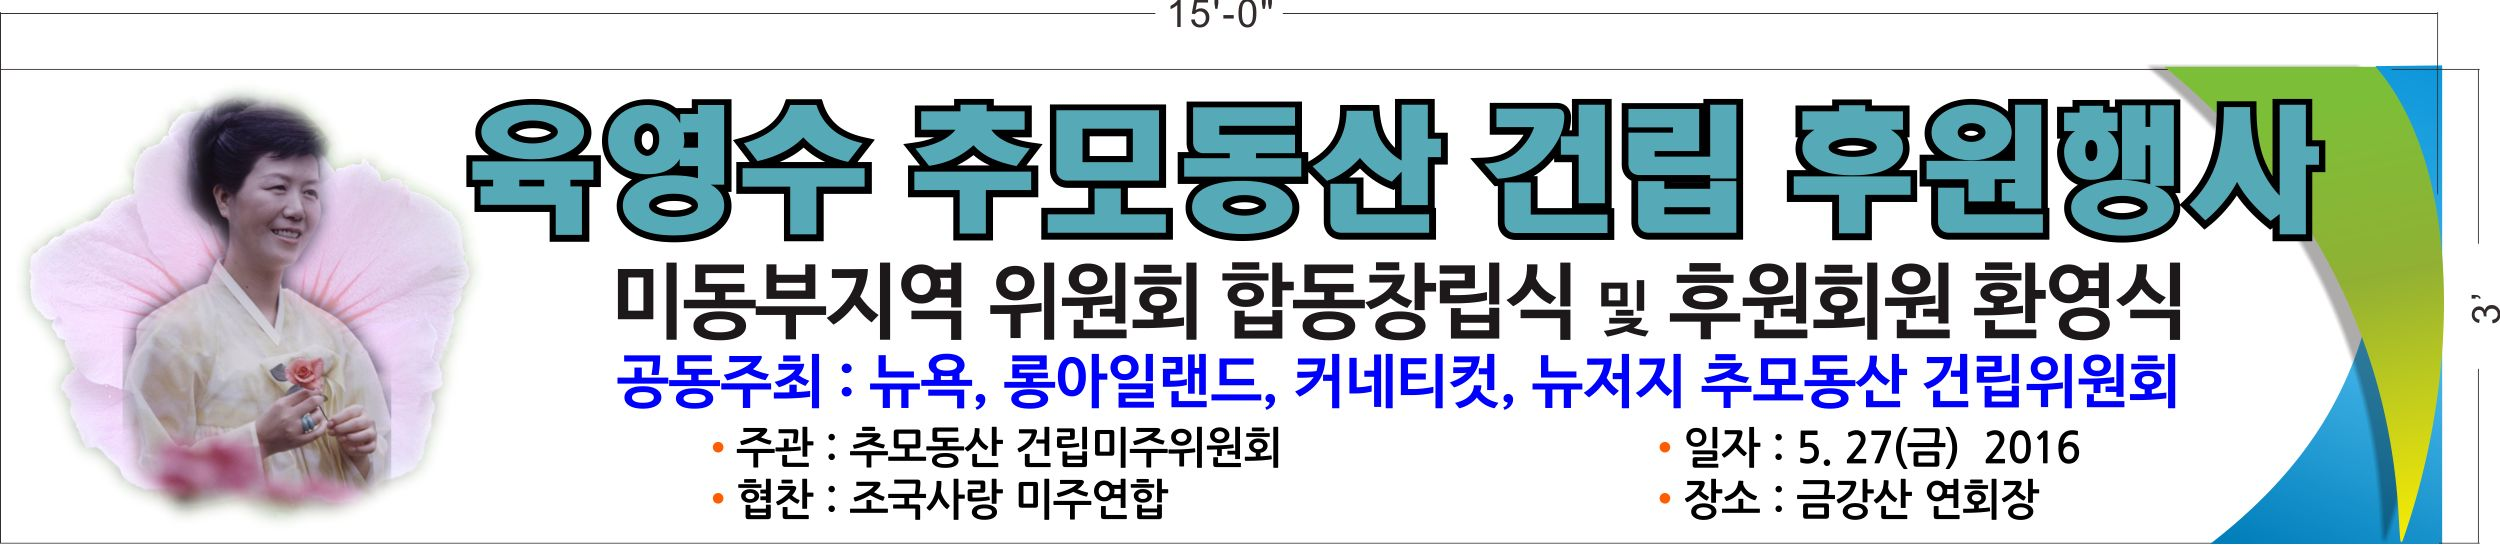 Banner_ 추모동산NY 행사 완성본word.jpg